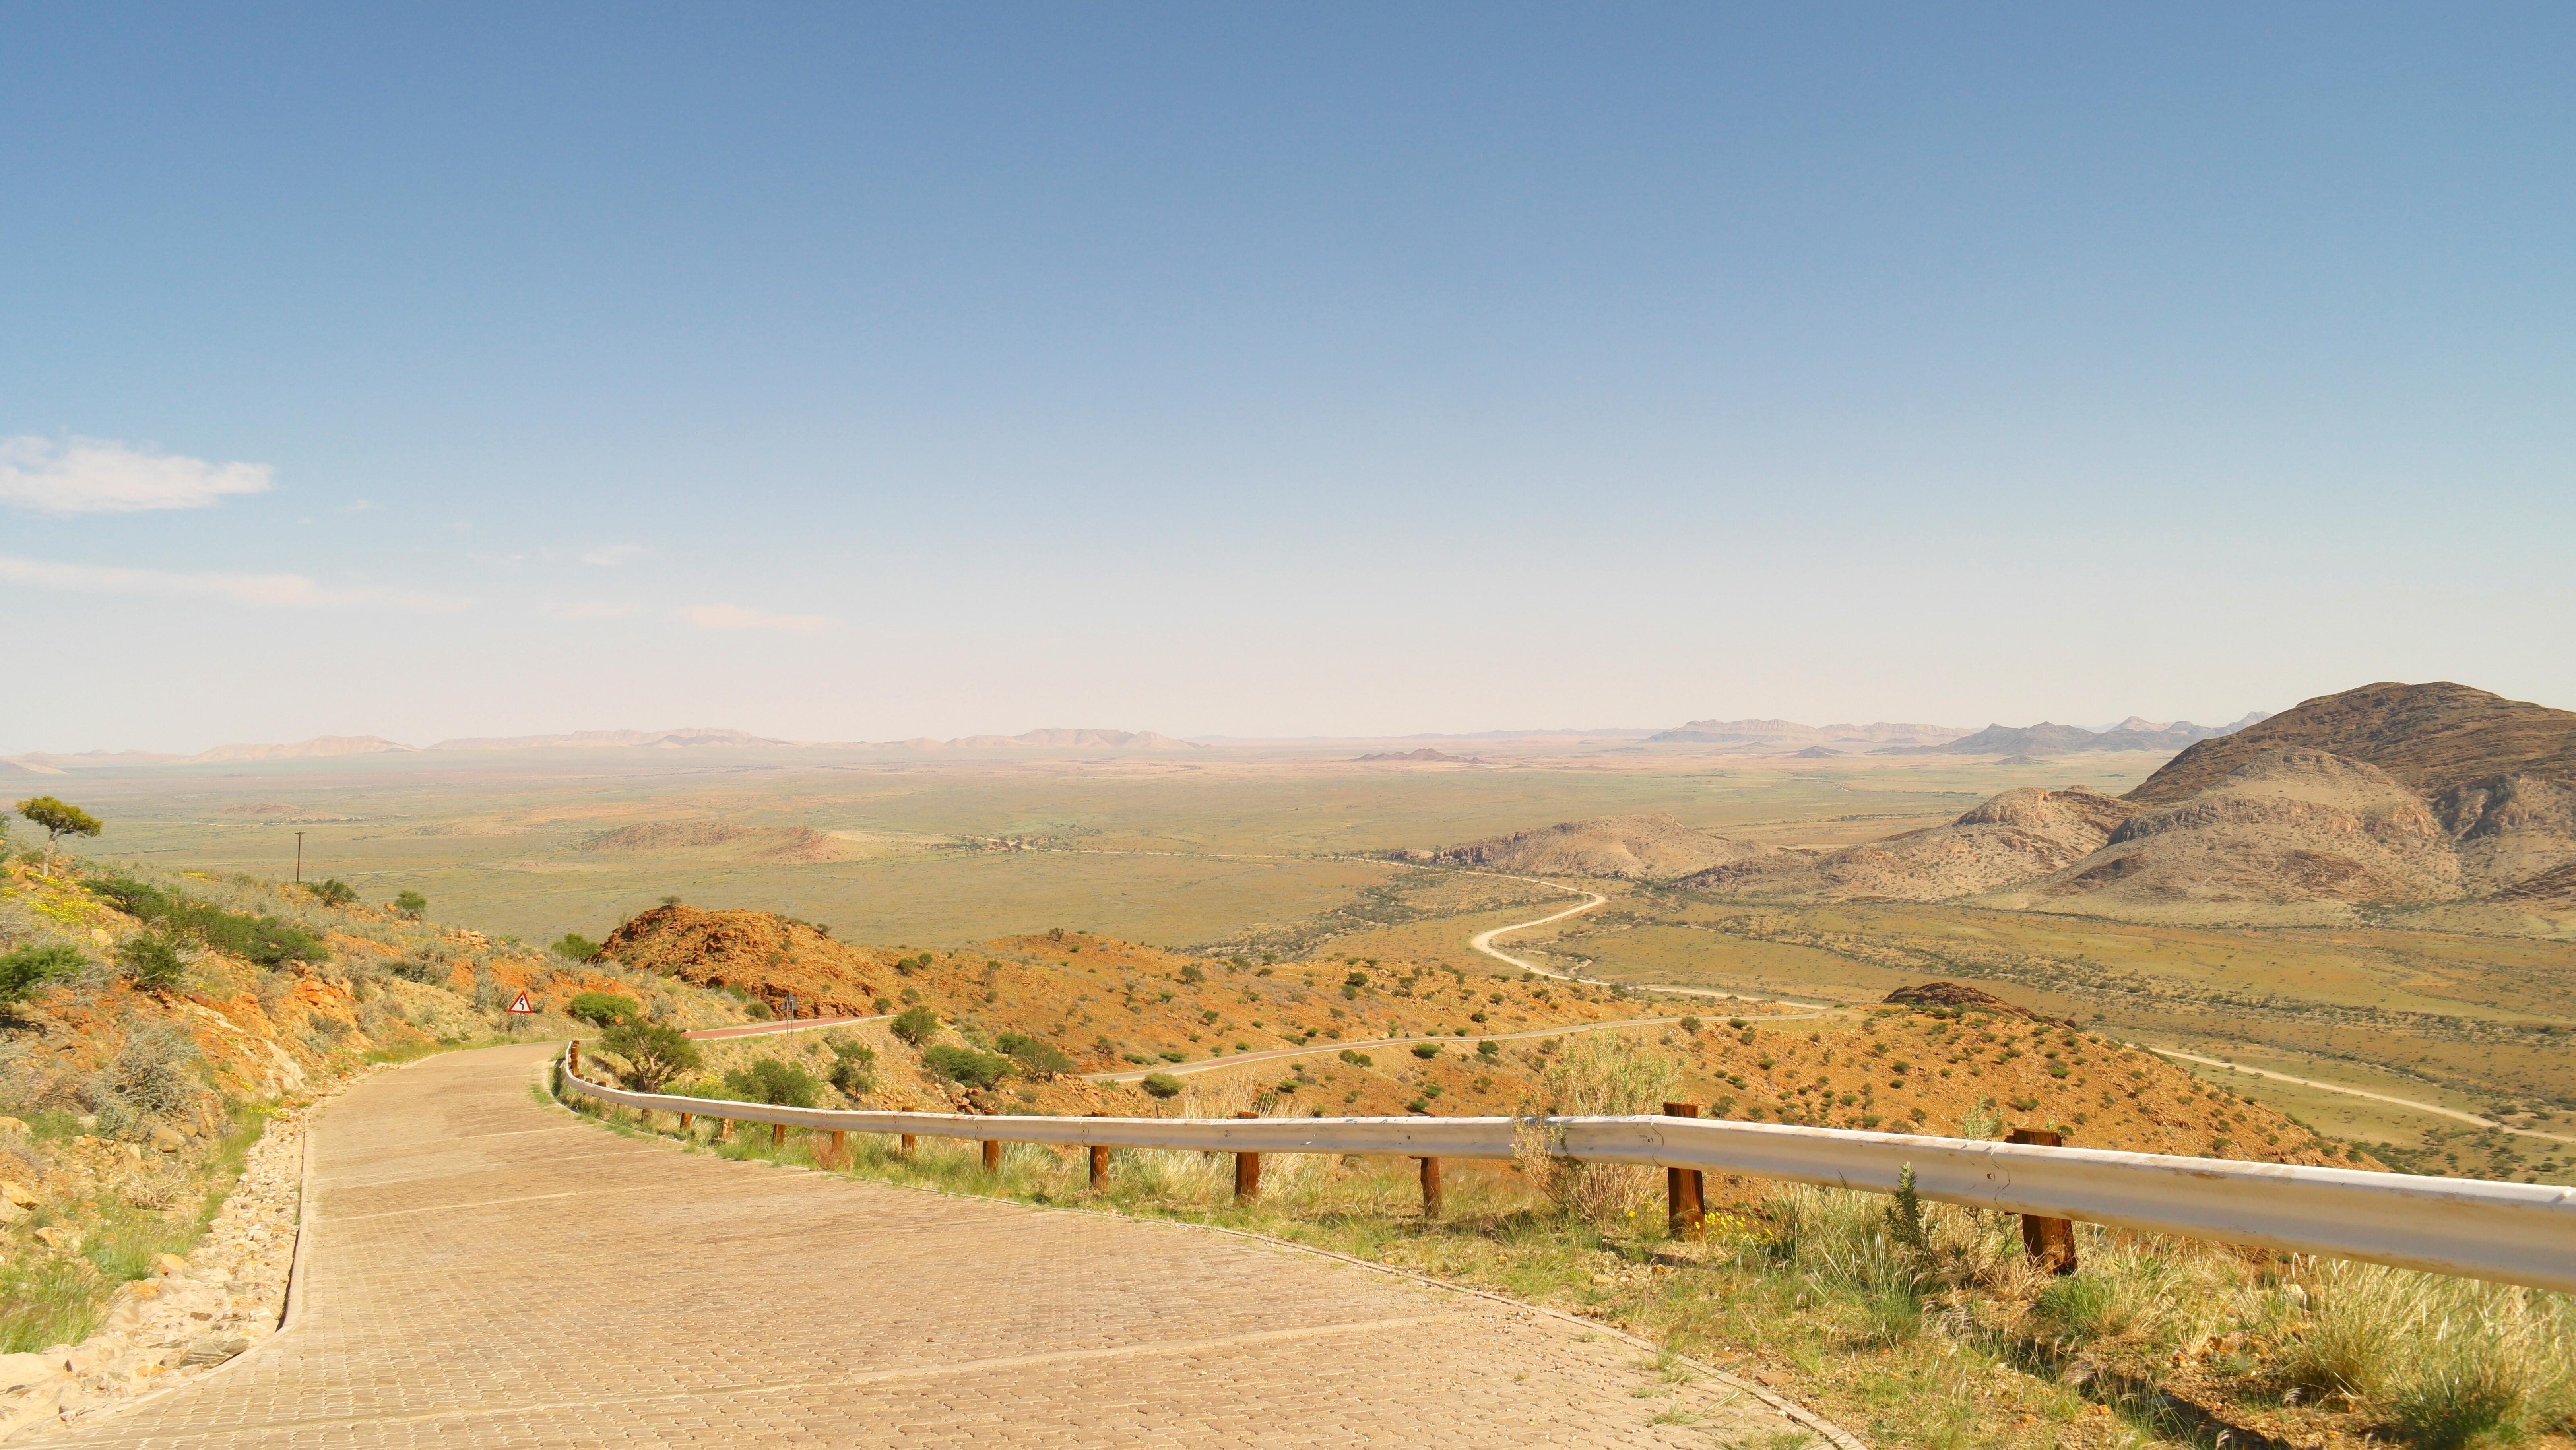 Spreetshoogte-Pass-namibia-lustforthesublime